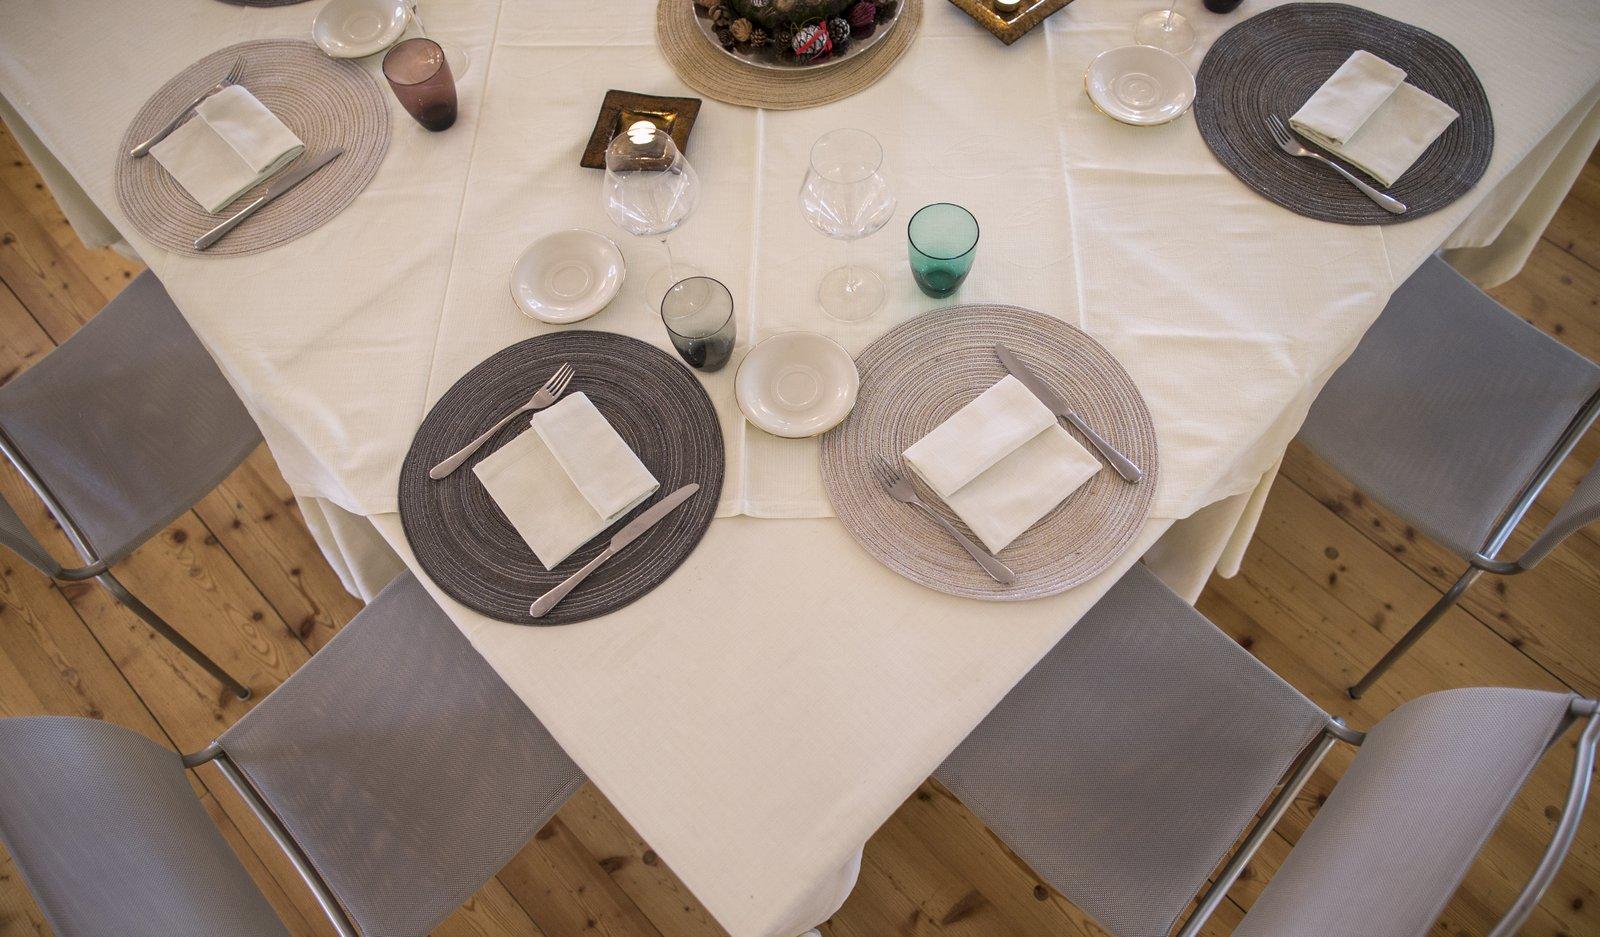 locanda-del-passatore-ristorante-valledicembra